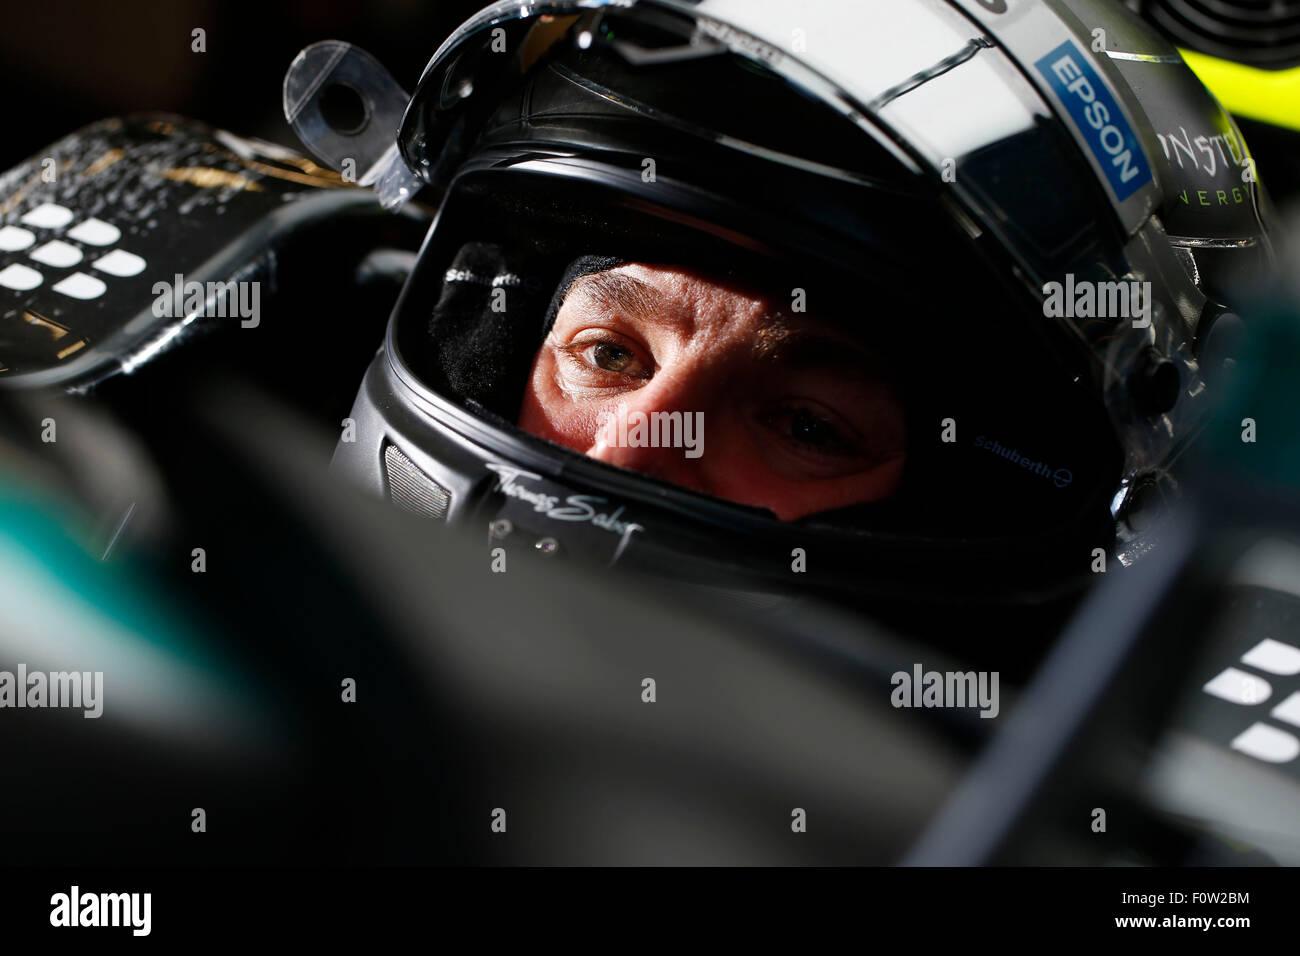 Circuit de Spa-Francorchamps, Belgien. 21. August 2015. Motorsport: FIA Formula One World Championship 2015, Grand Stockbild